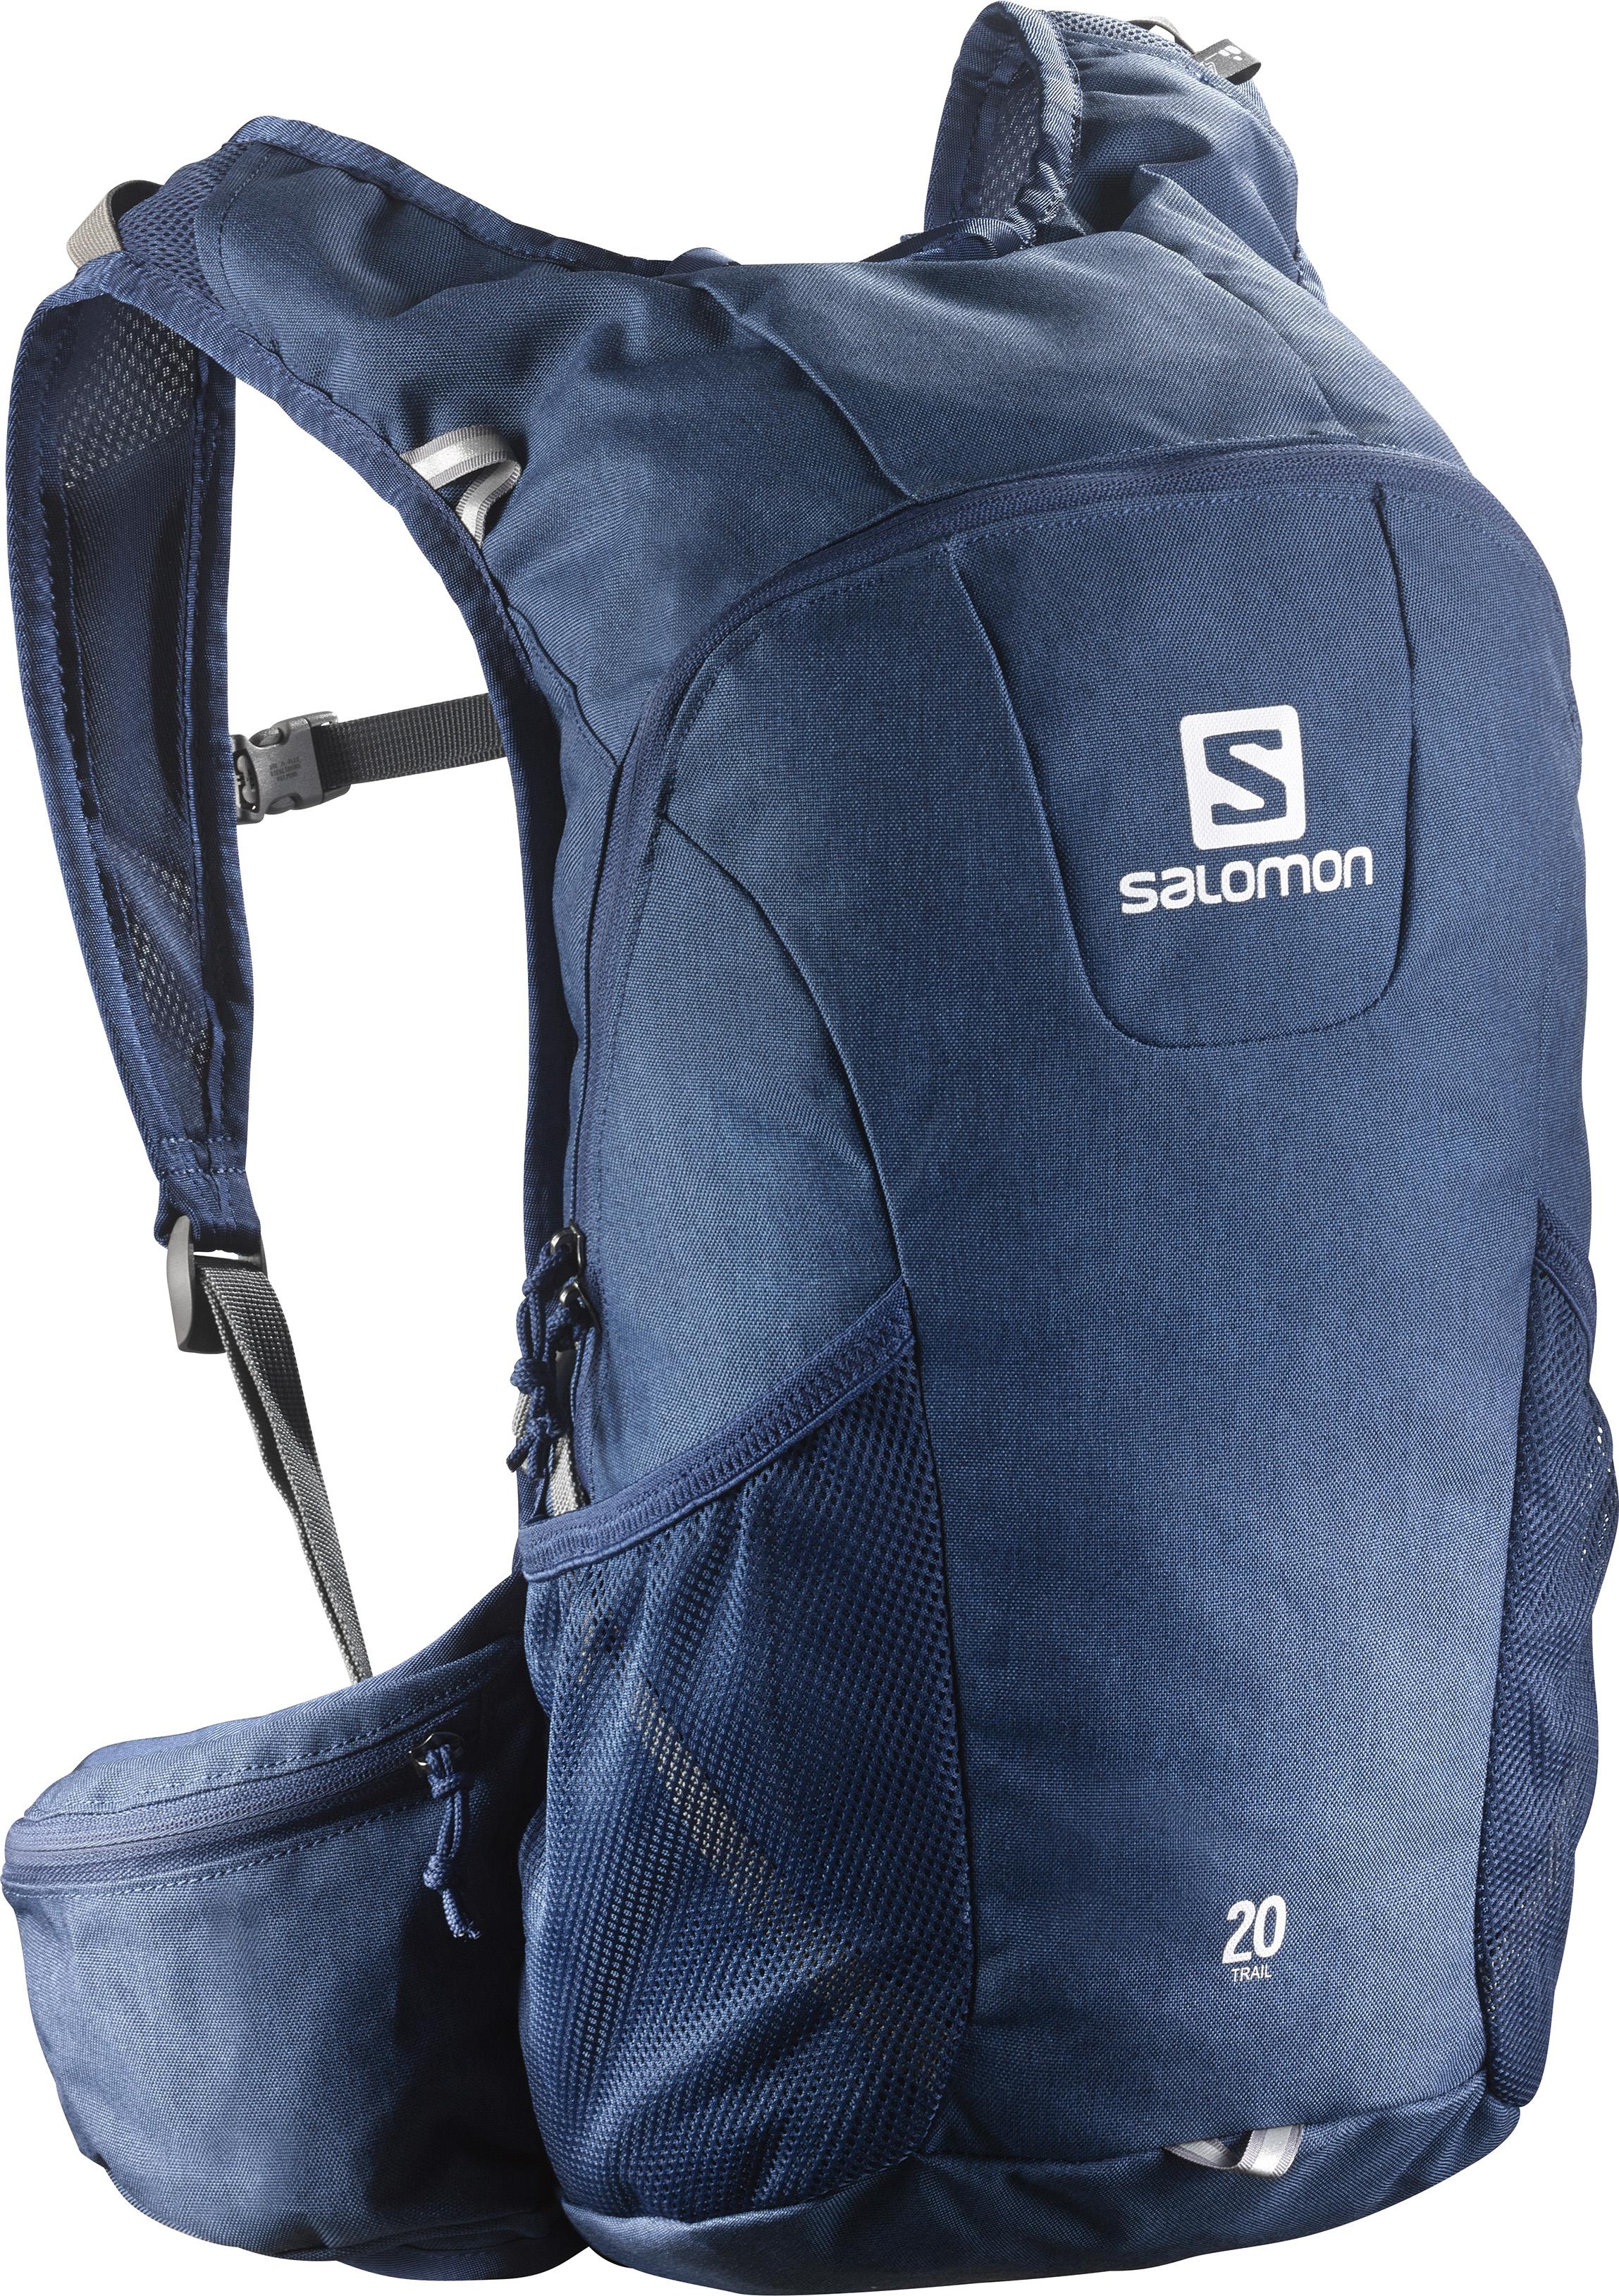 Salomon Trail 20 Midnight Blue 379987 fialová